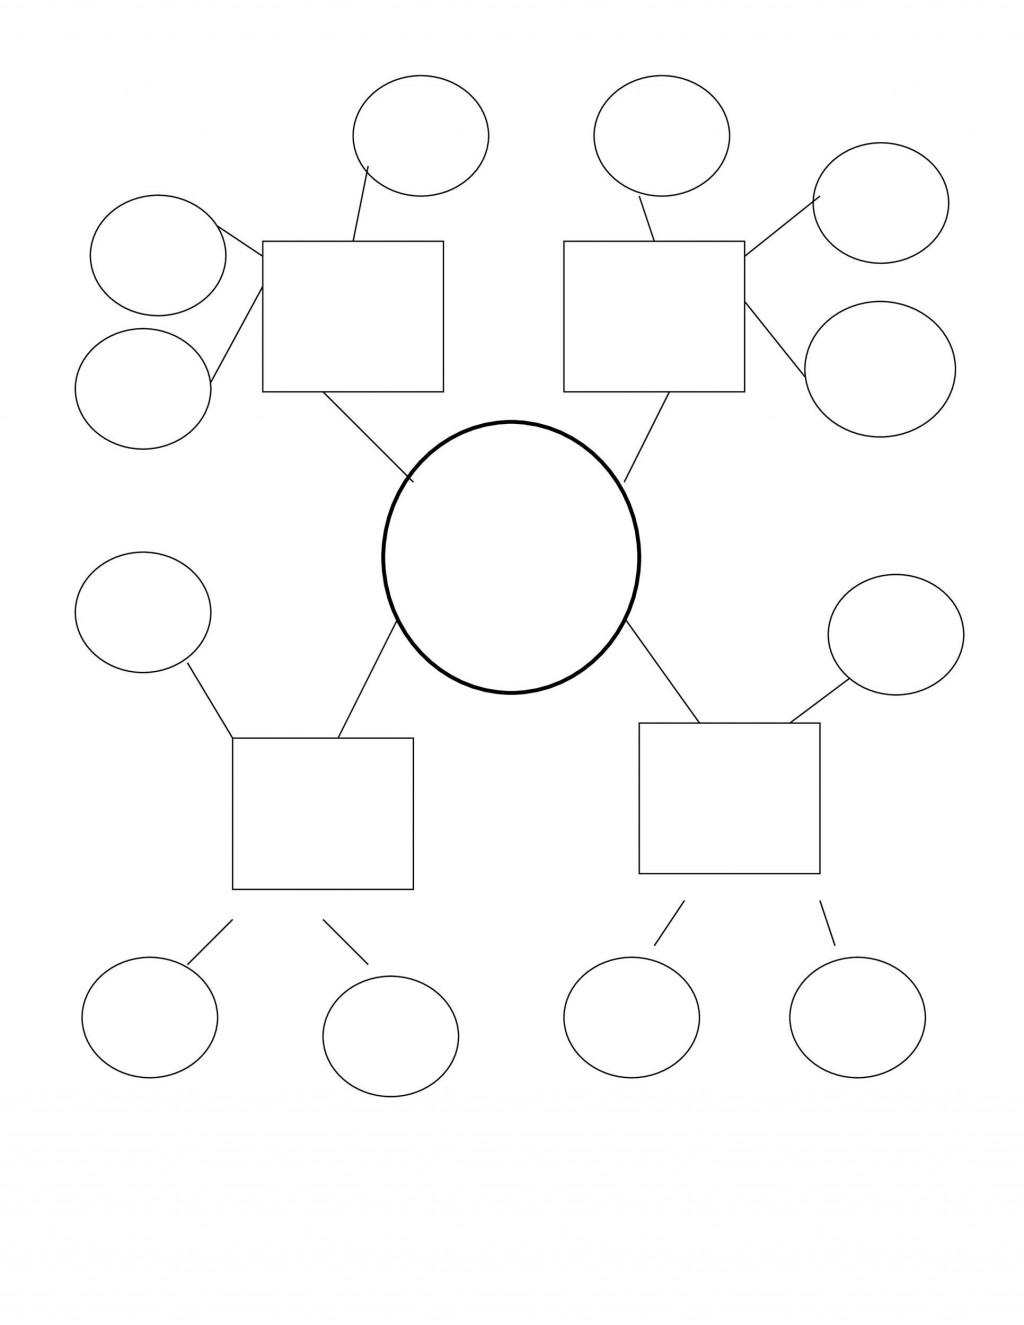 010 Remarkable Free Blank Concept Map Template Sample  Printable NursingLarge